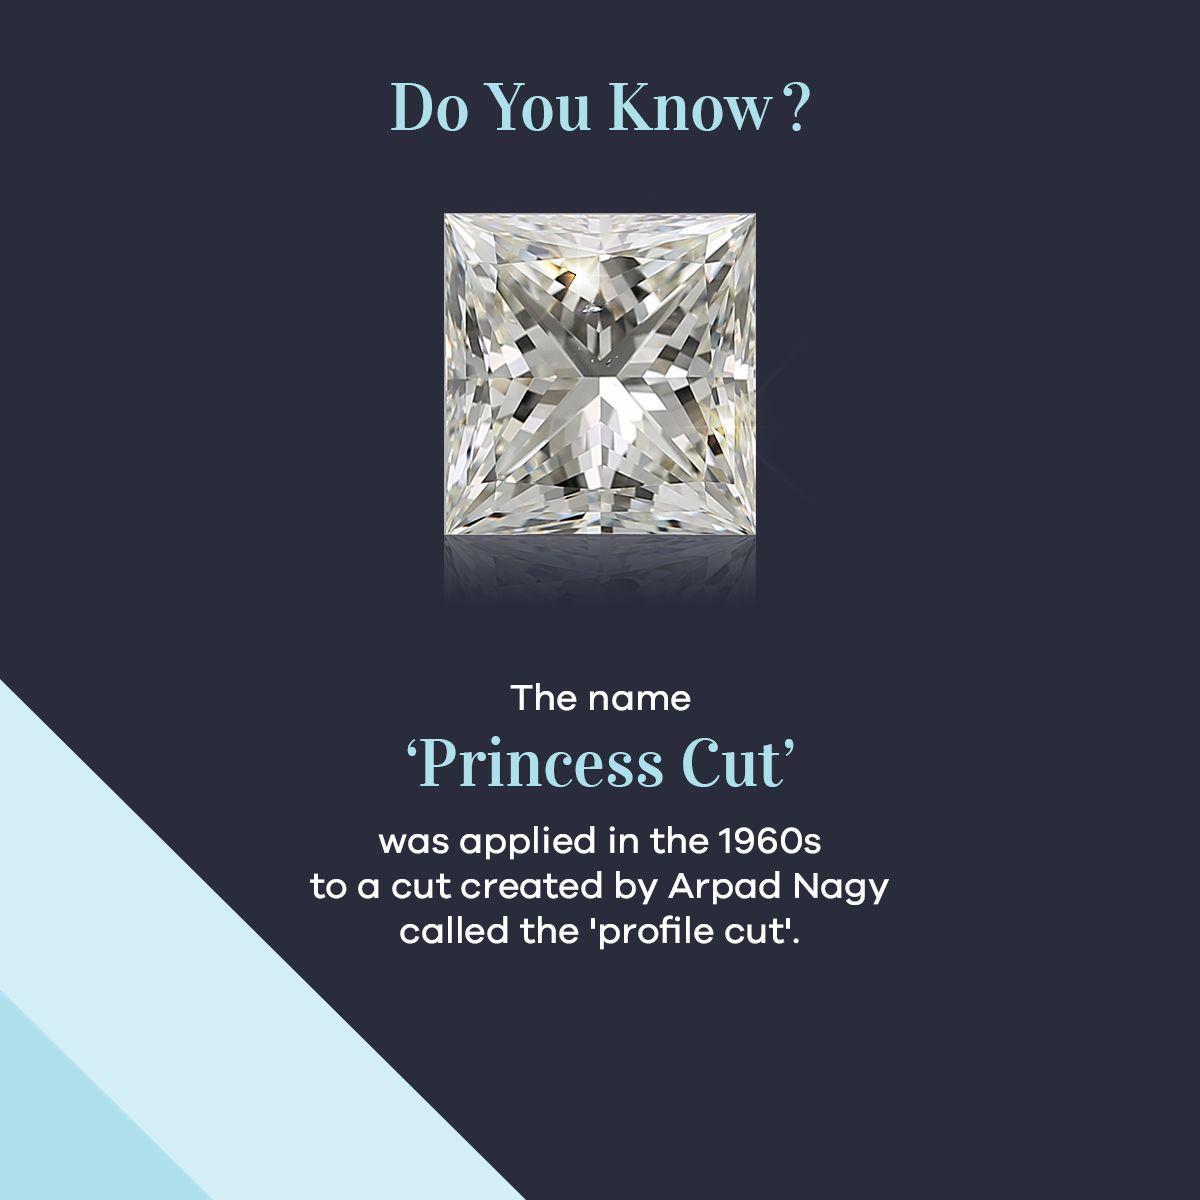 Shree Ramkrishna Exports Pvt. Ltd. on LinkedIn: #PrincessCutDiamond #DoYouKnow #NaturalDiamonds